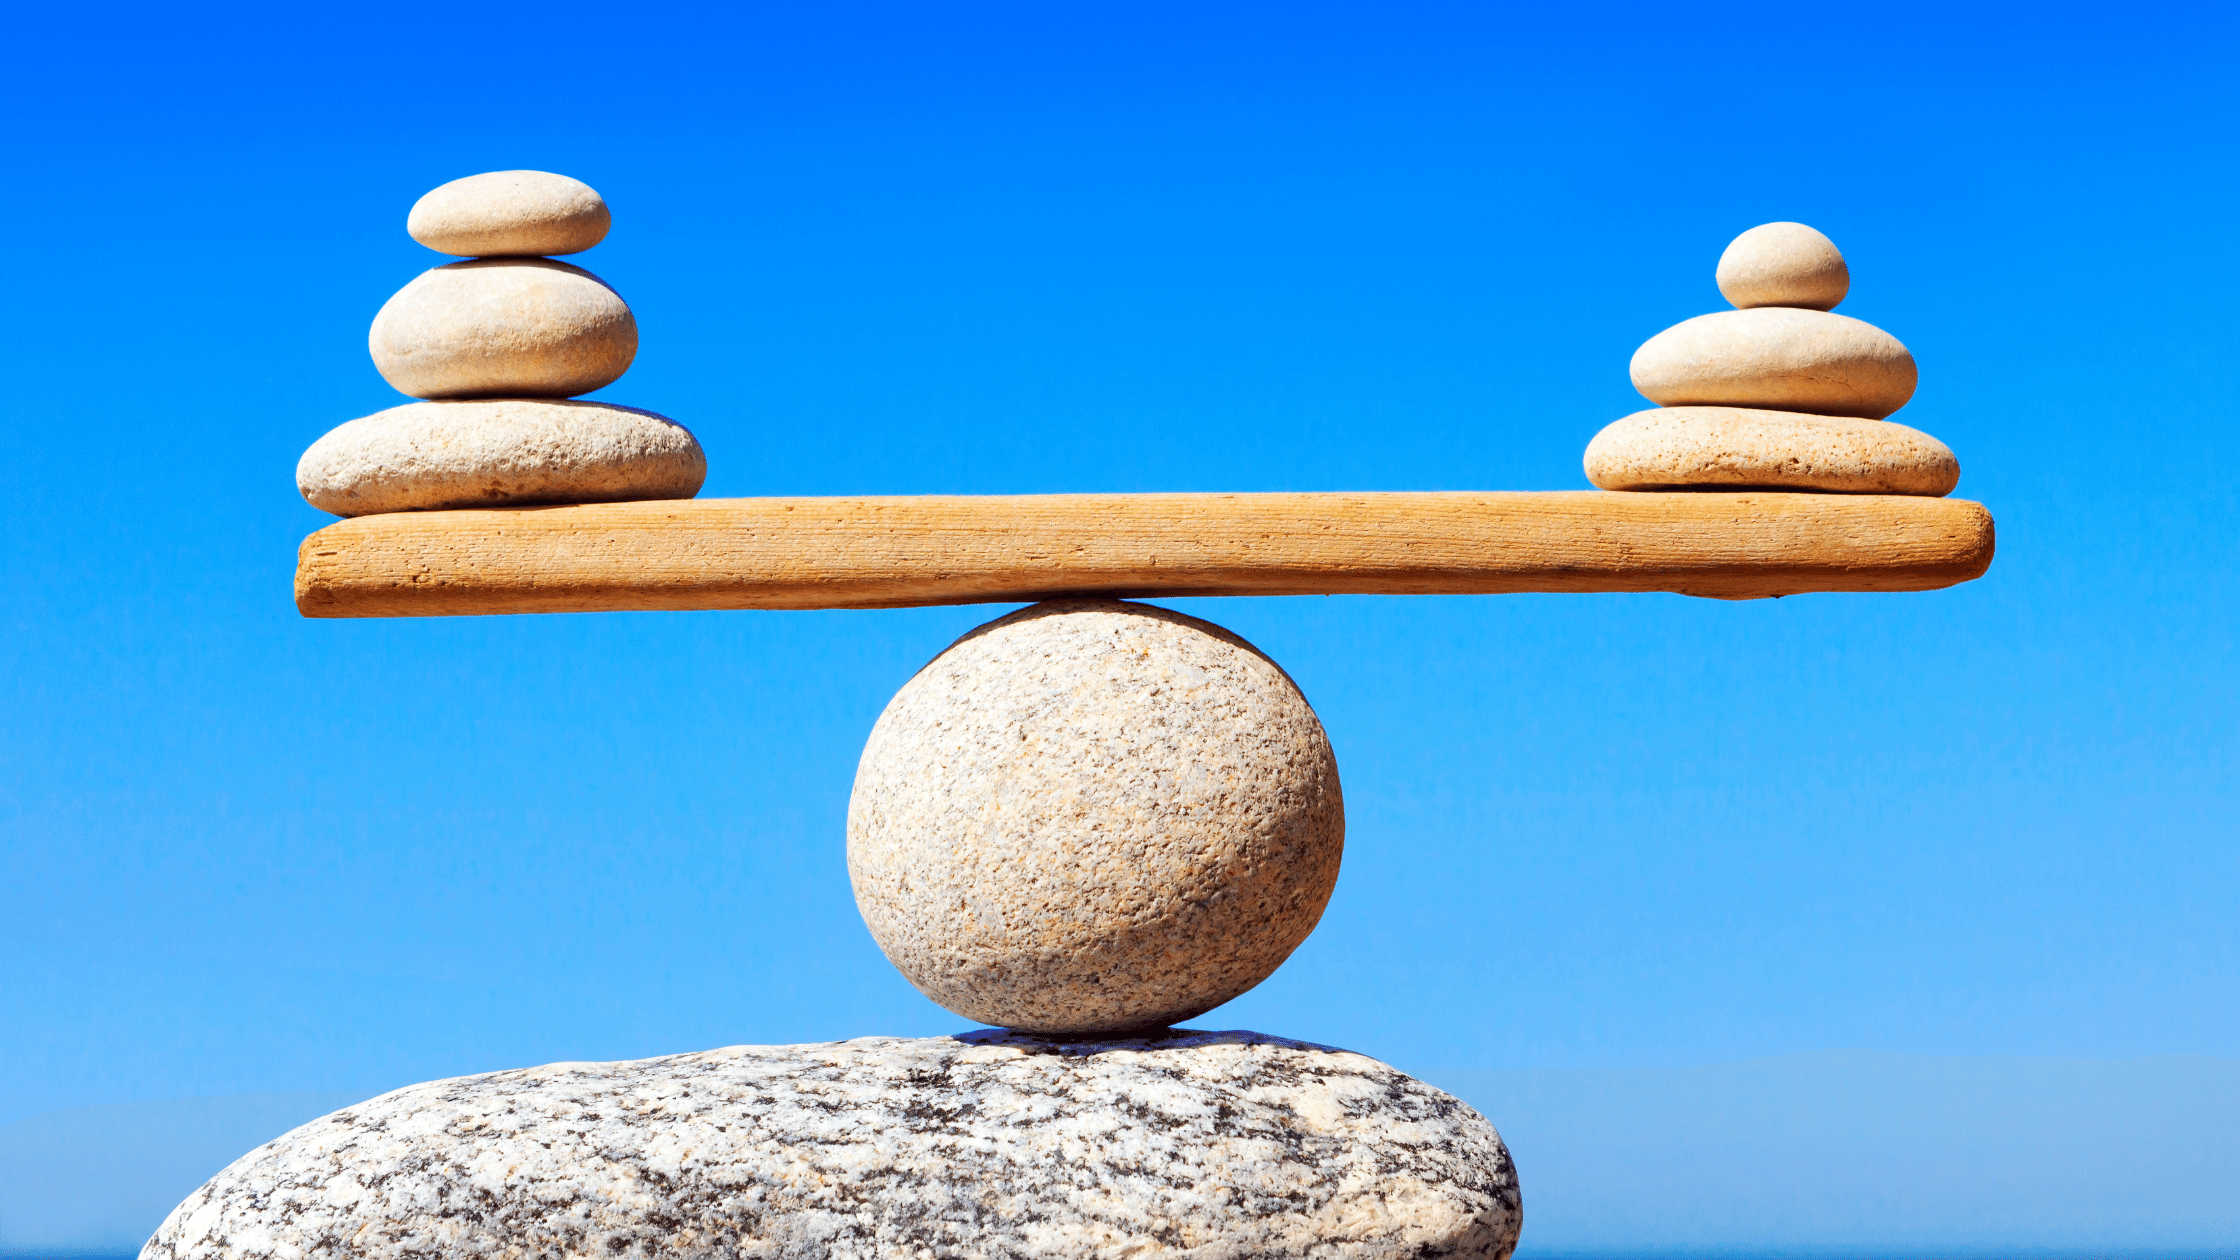 rocks balancing on a plank